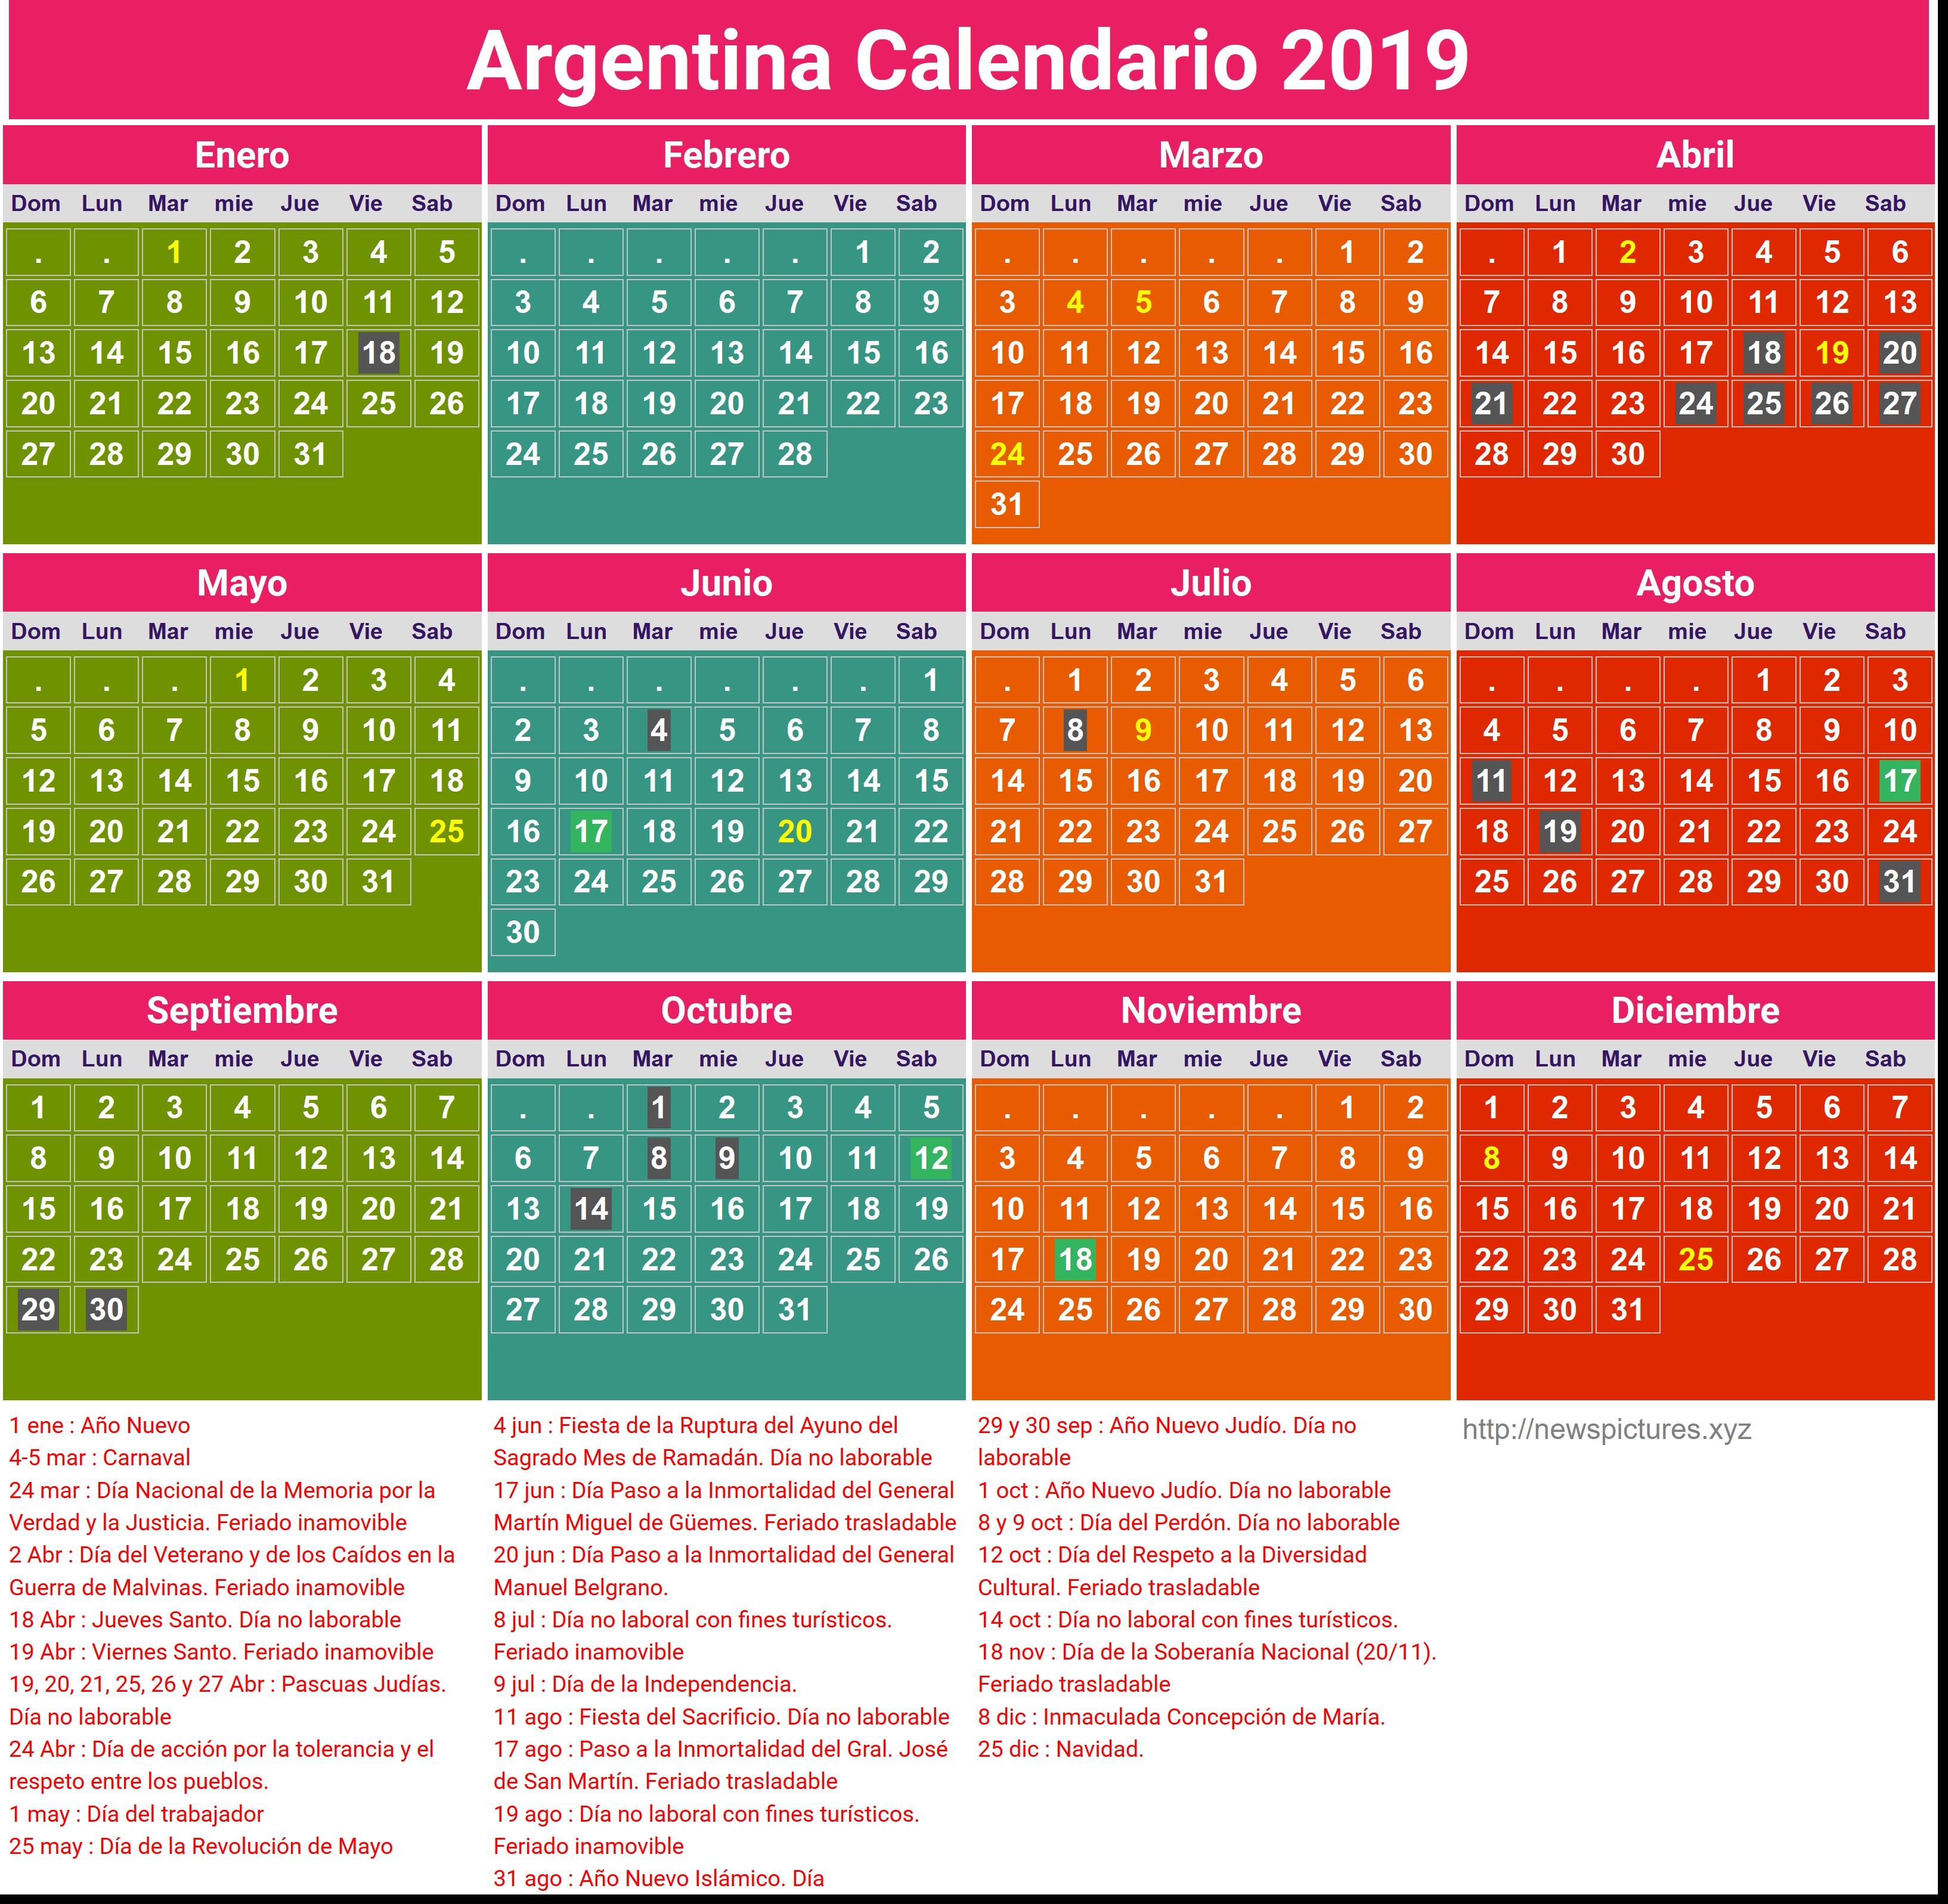 Calendario 2019 Mexico Dias Feriados Más Reciente Calendario 2018 Con Dias Festivos En Mexico Of Calendario 2019 Mexico Dias Feriados Más Populares United isd Academic Calendar